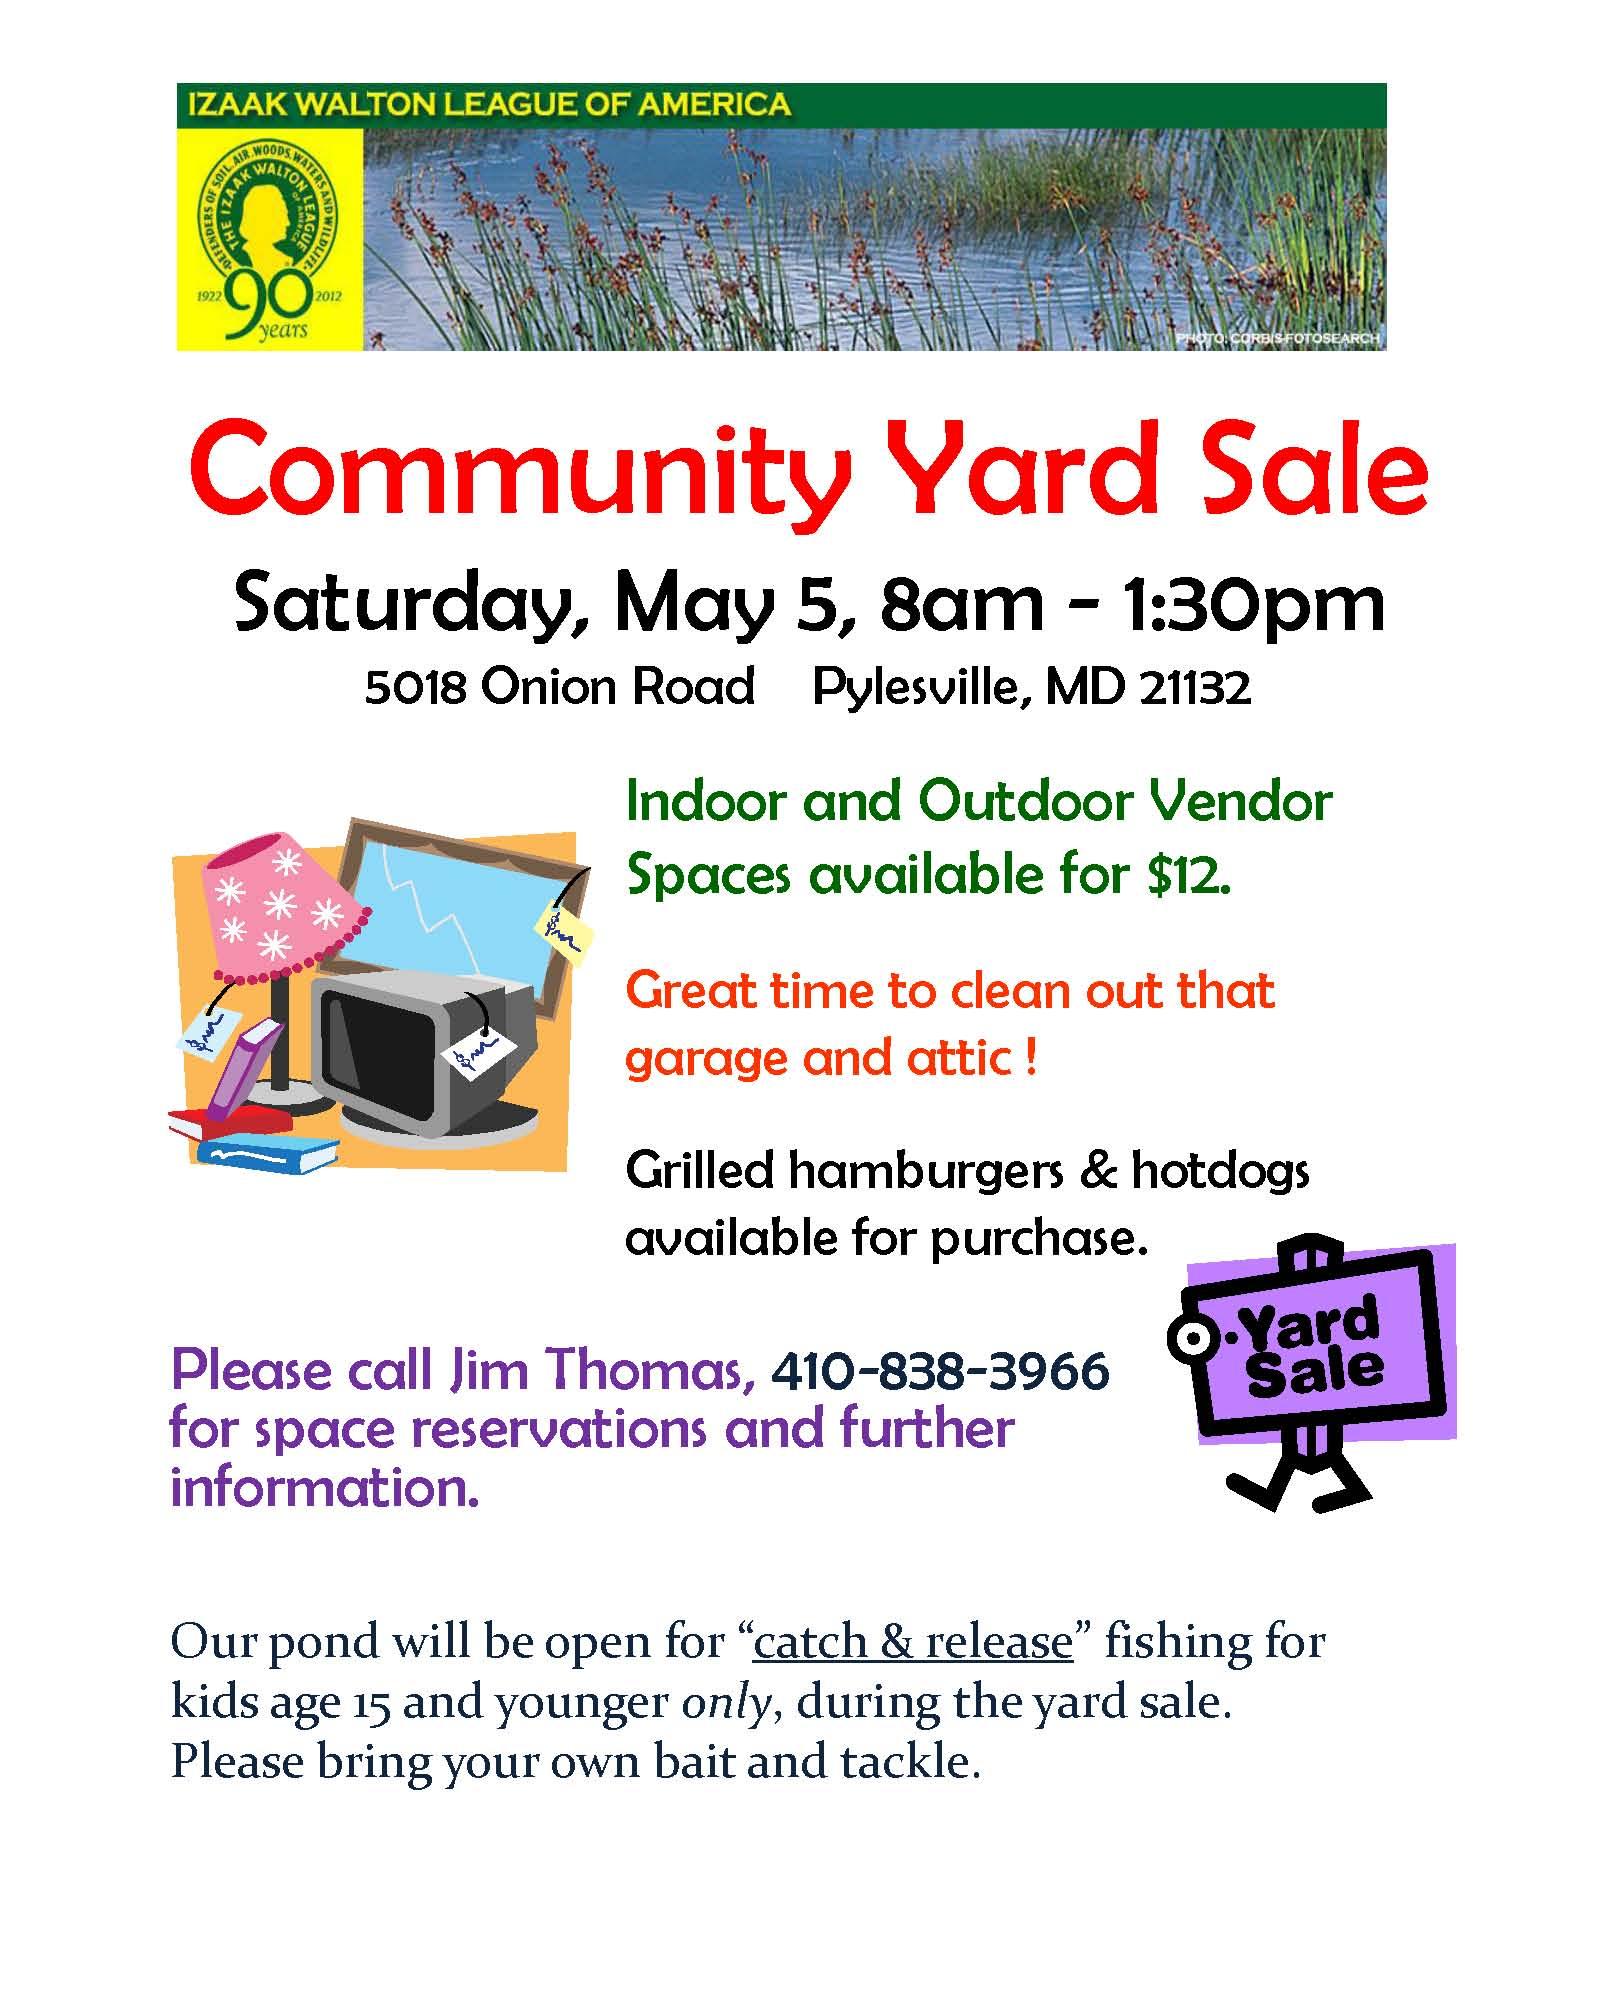 Global Views Garage Sale: Izaak Walton Chapter Community Yard Sale To Feature